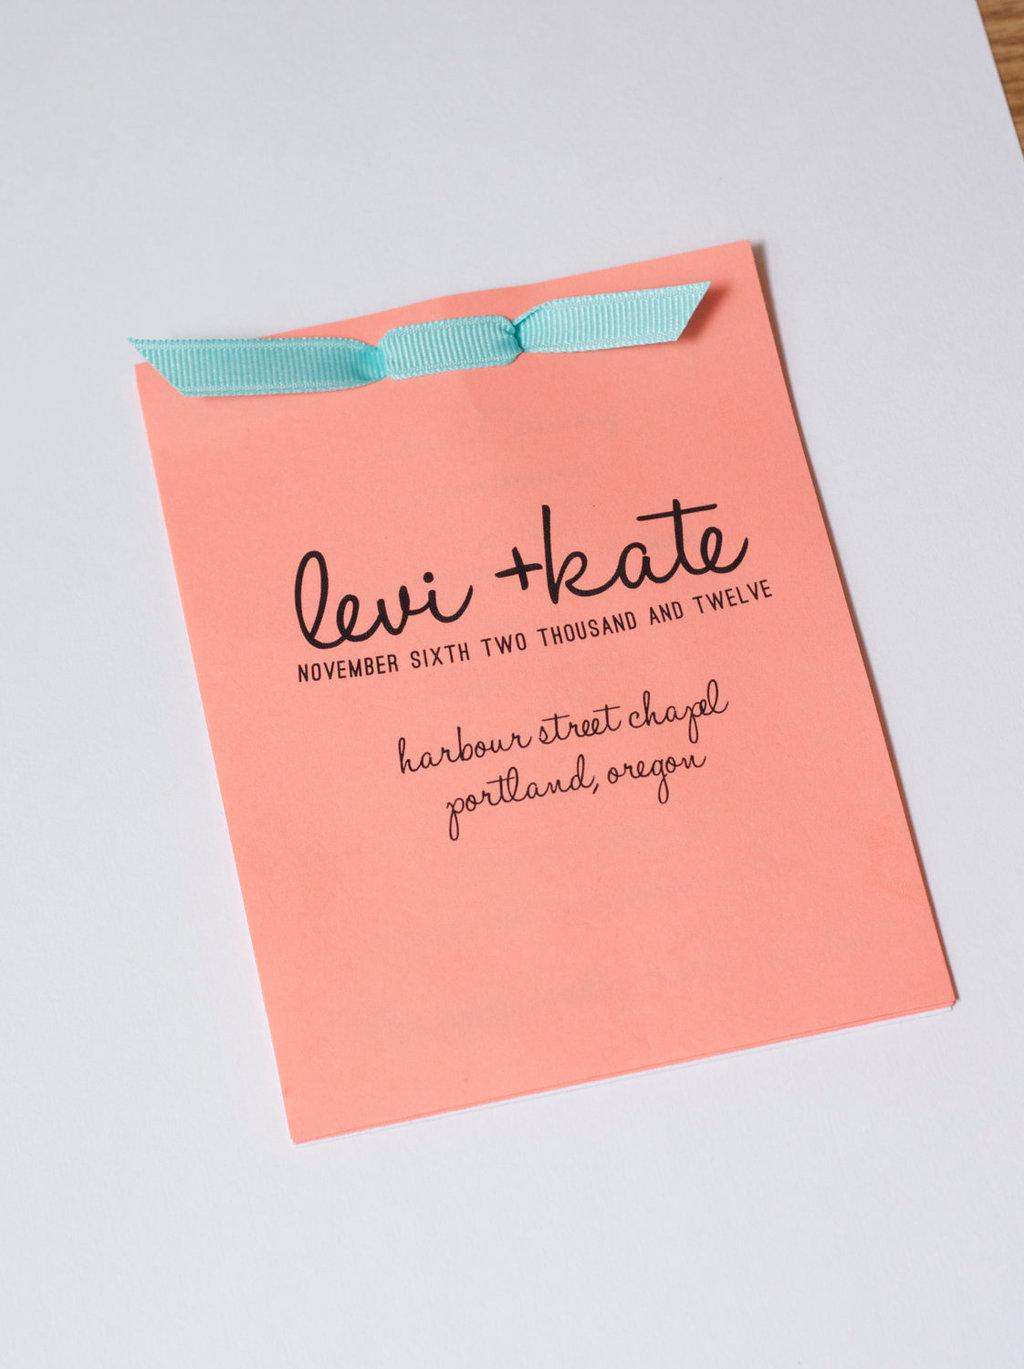 Coral-aquamarine-wedding-save-the-dates.full